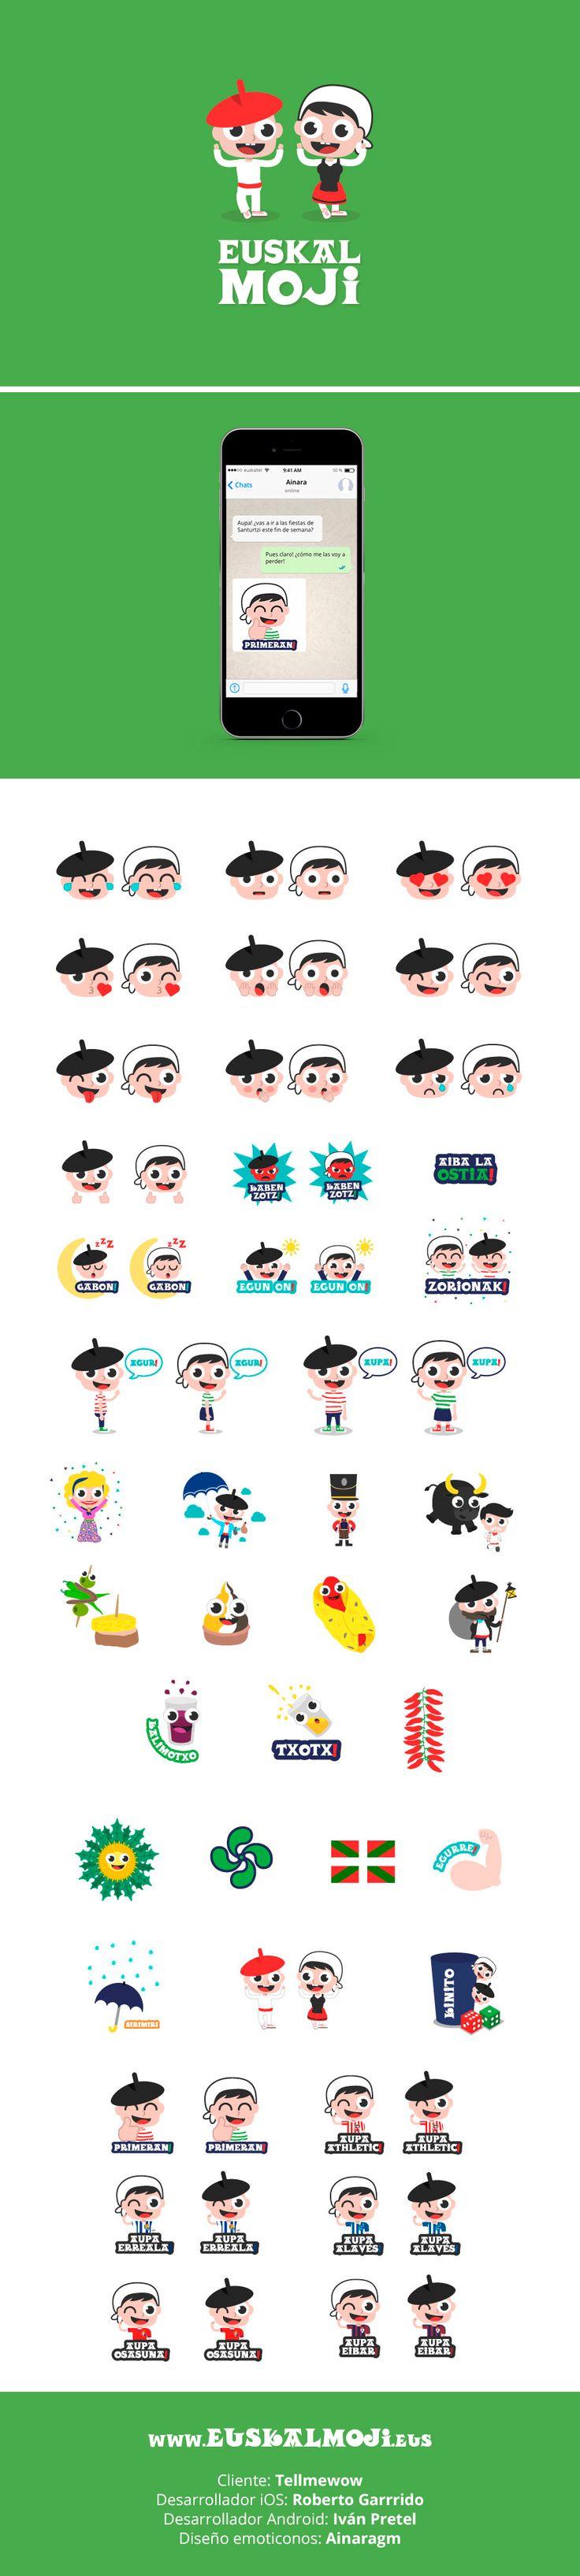 Diseño de emoticonos para la app Euskalmoji. #emoticono #emoji #icono #ilustracion